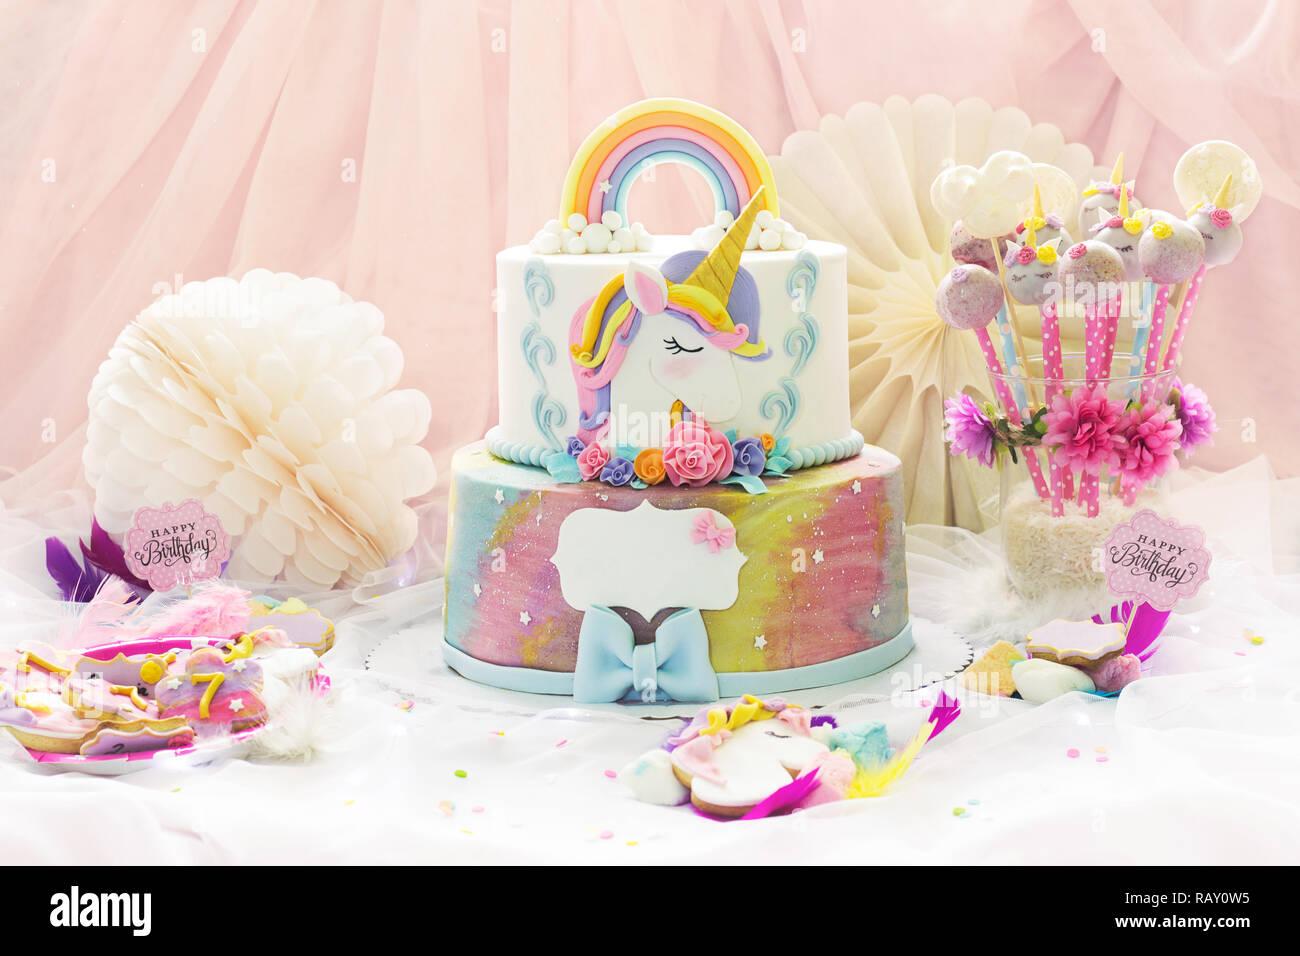 Marvelous Little Girls Birthday Party Dessert Table With Unicorn Cake Funny Birthday Cards Online Alyptdamsfinfo